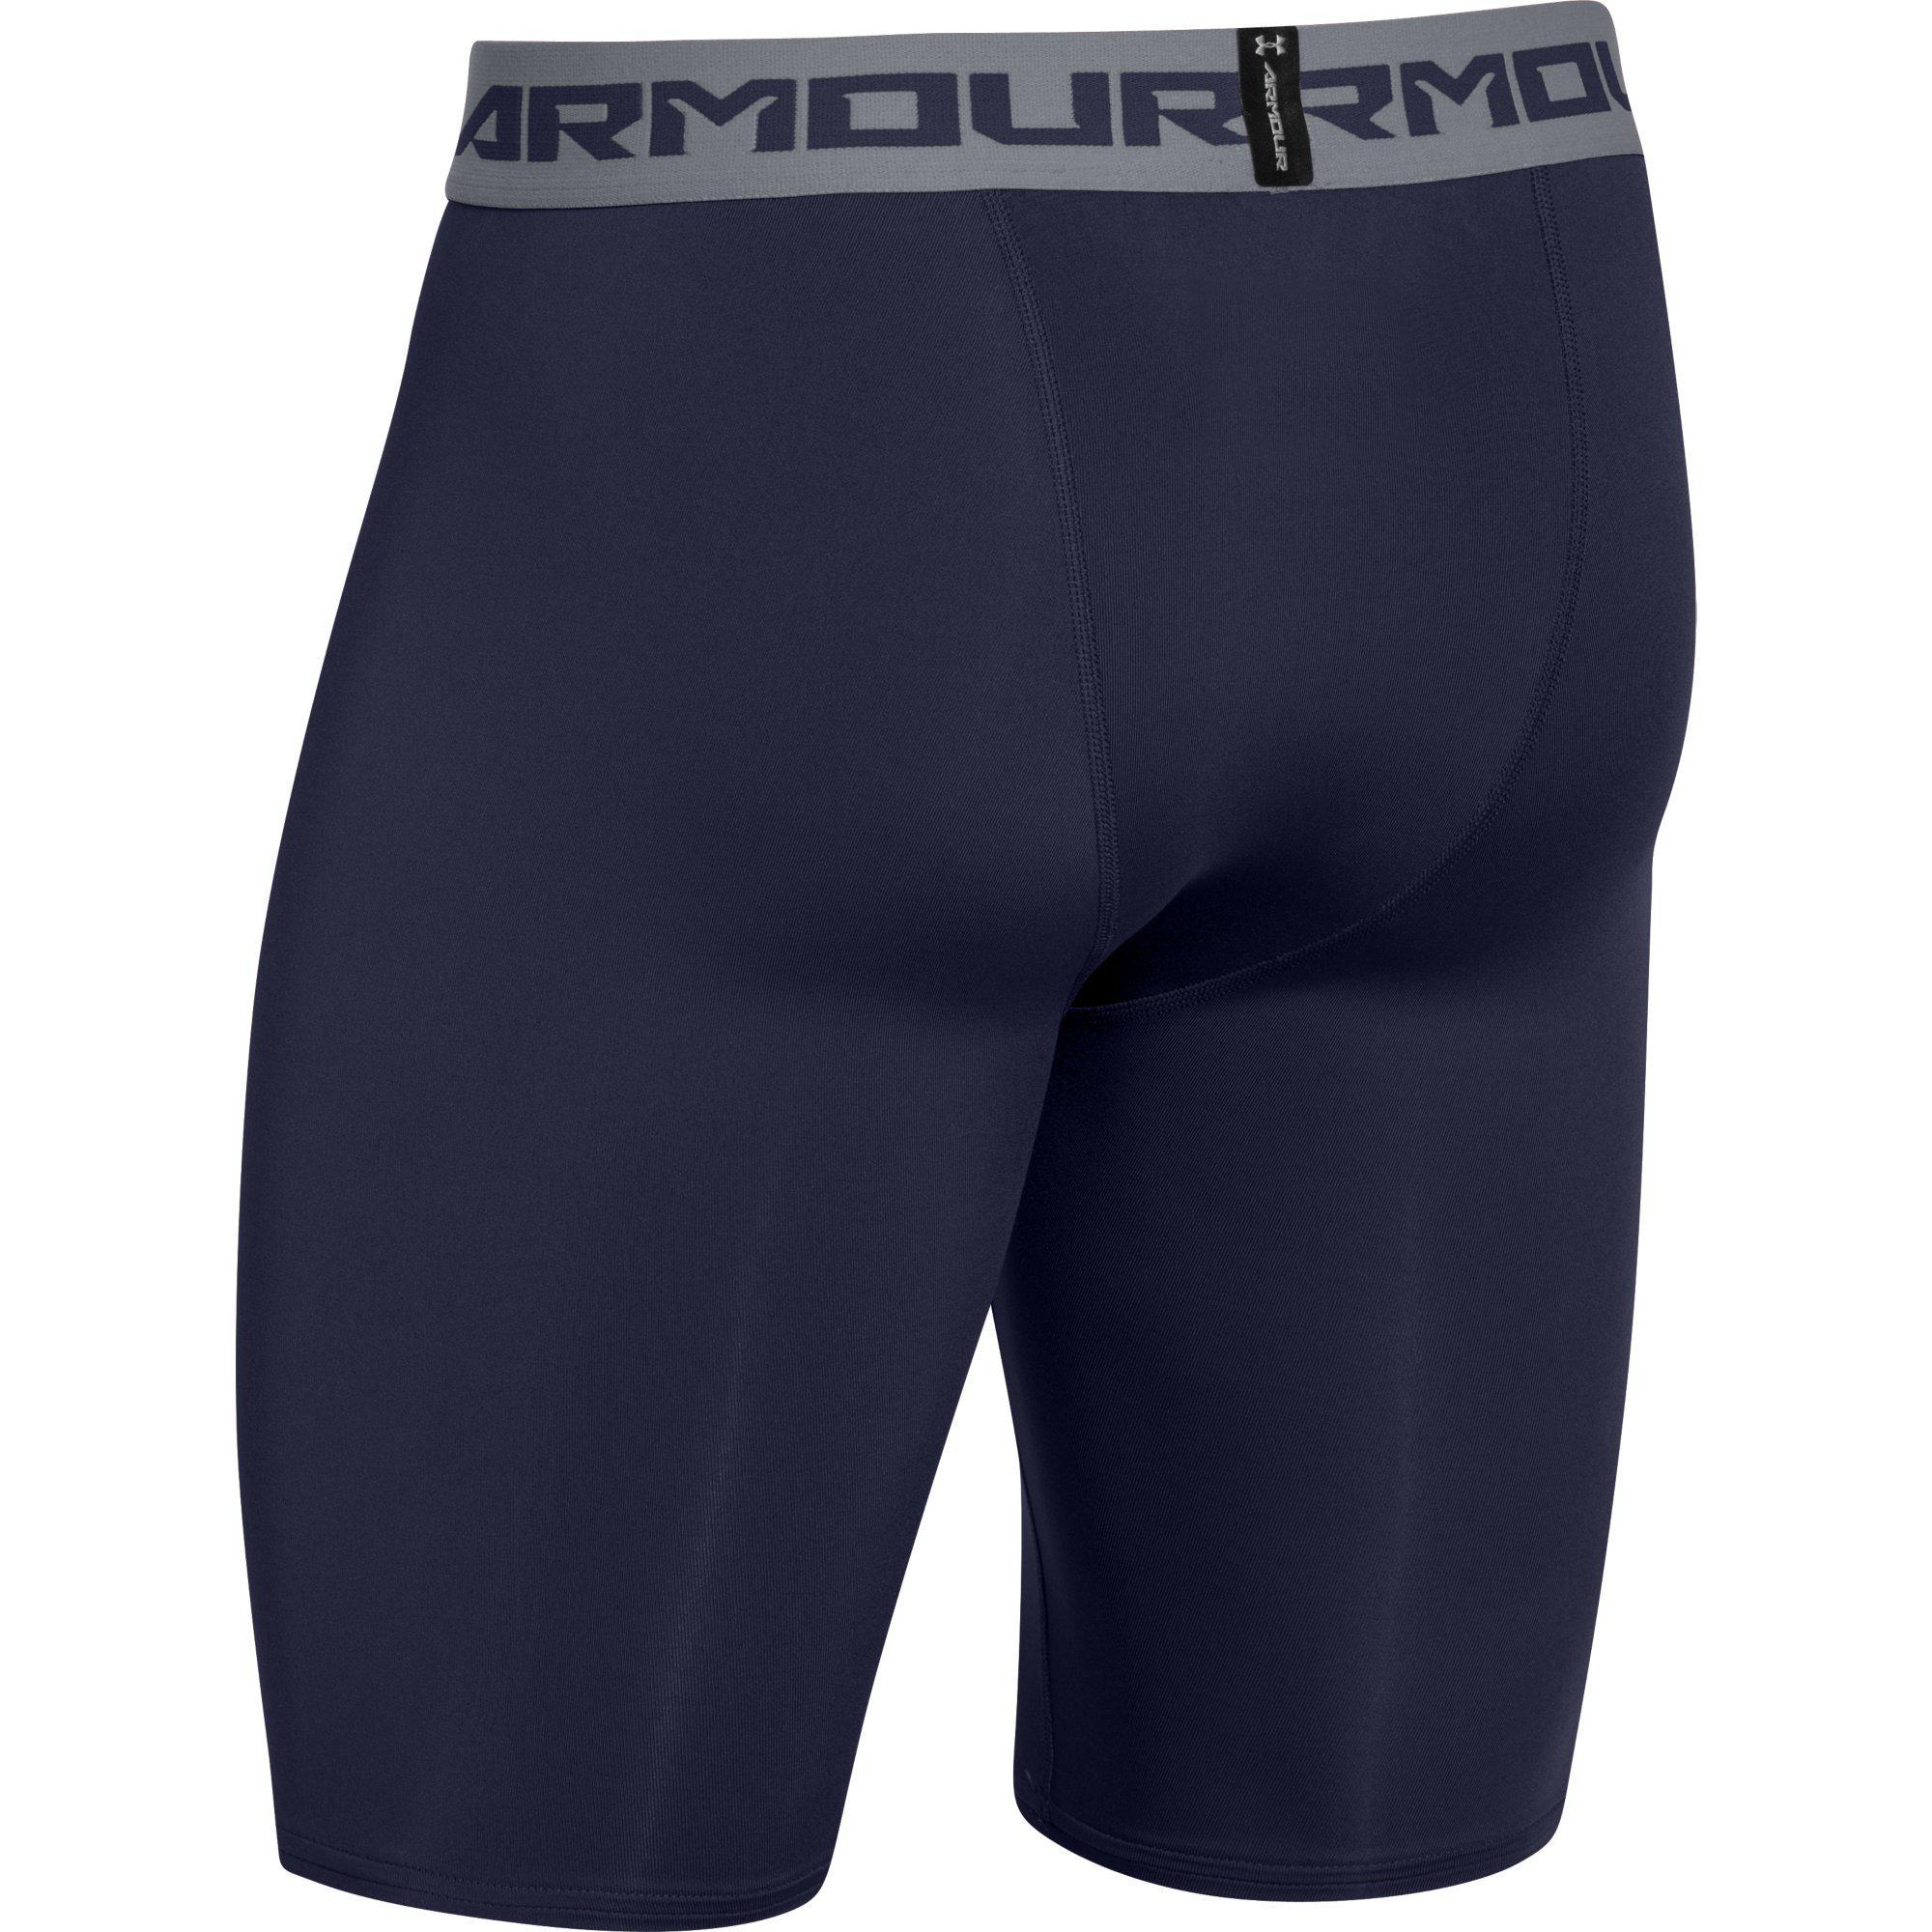 Under Armour Mens HeatGear Long Compression Short - Blue ... Compression Shorts For Men Under Armour